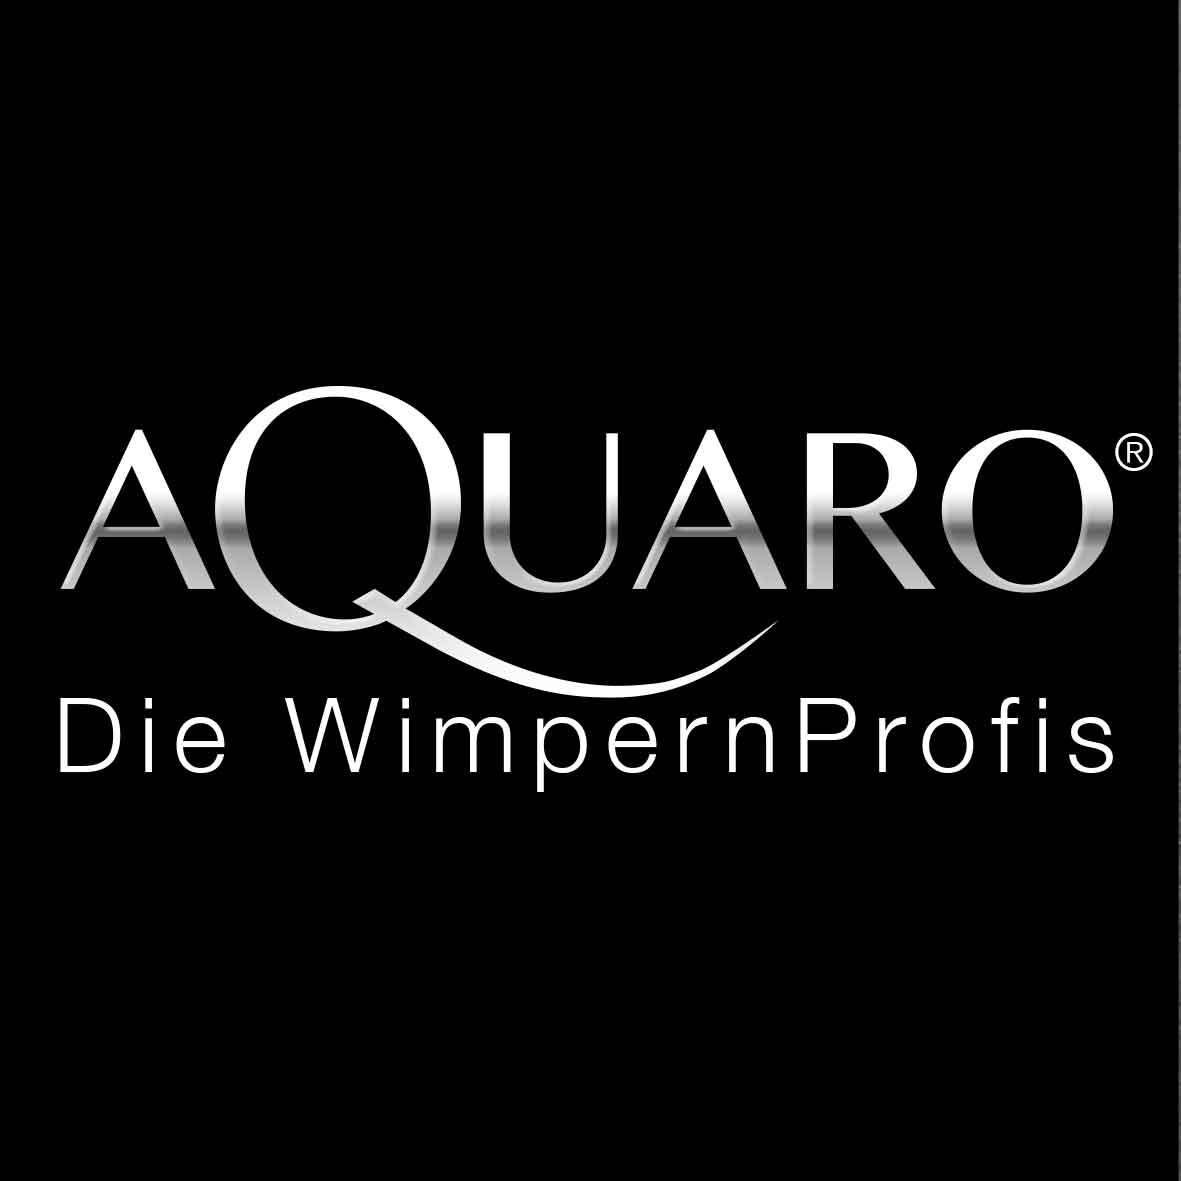 Aquaro-die-Wimpernprofis3a_aquarodesign